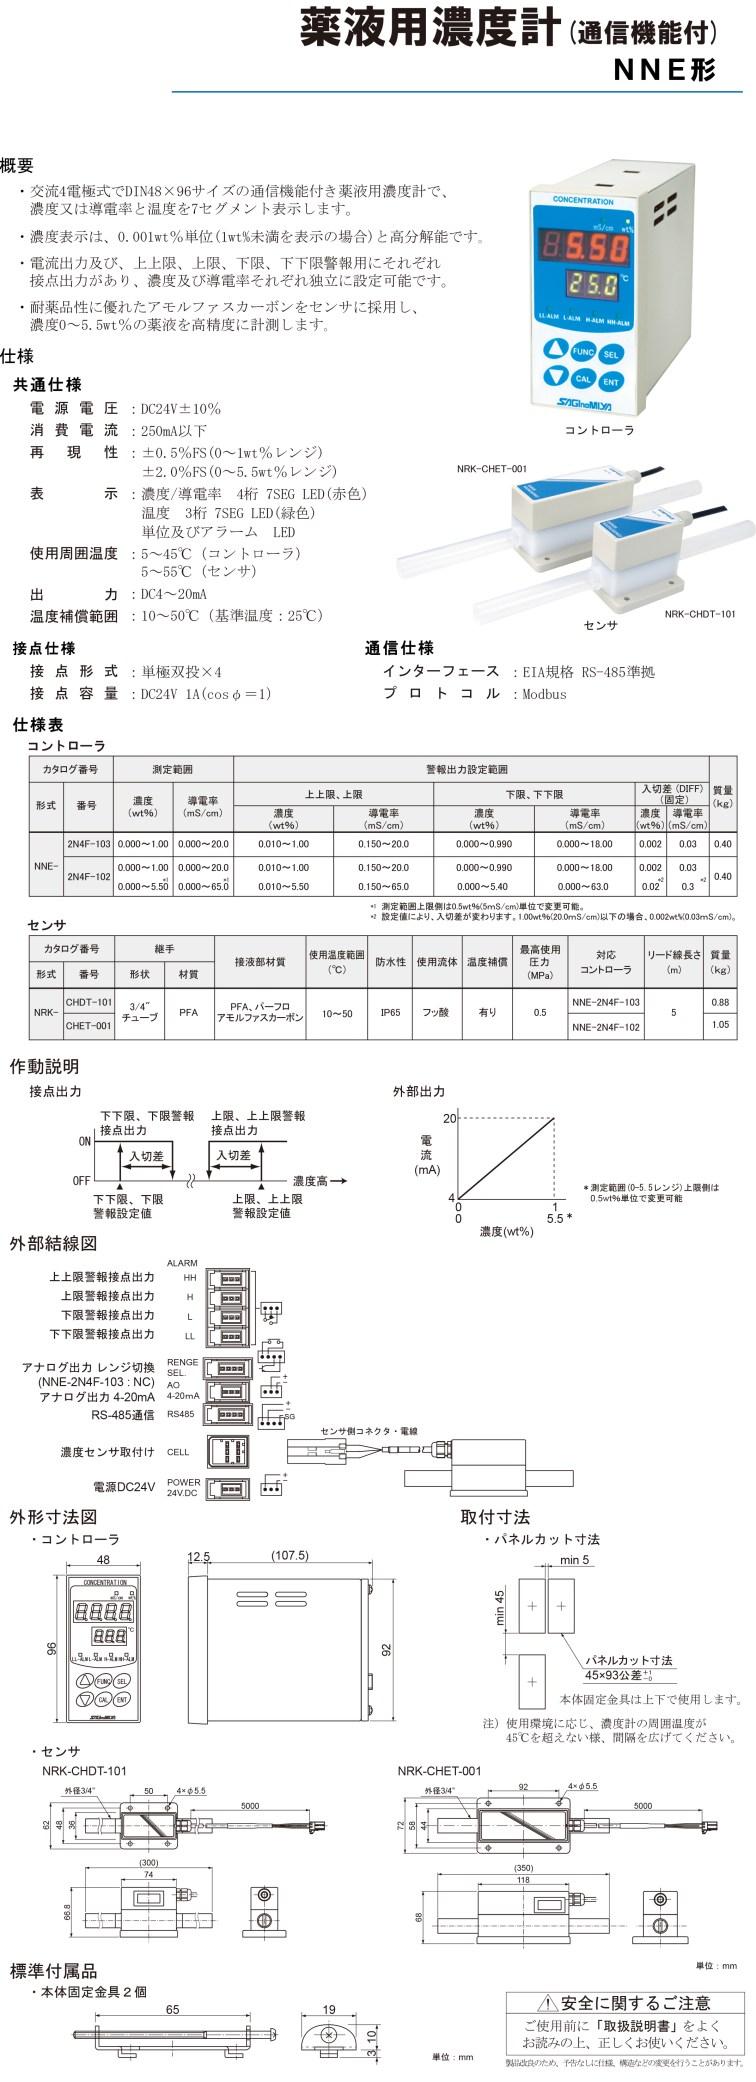 SAGINOMIYA,日本鷺工製作所,NNE,RNE